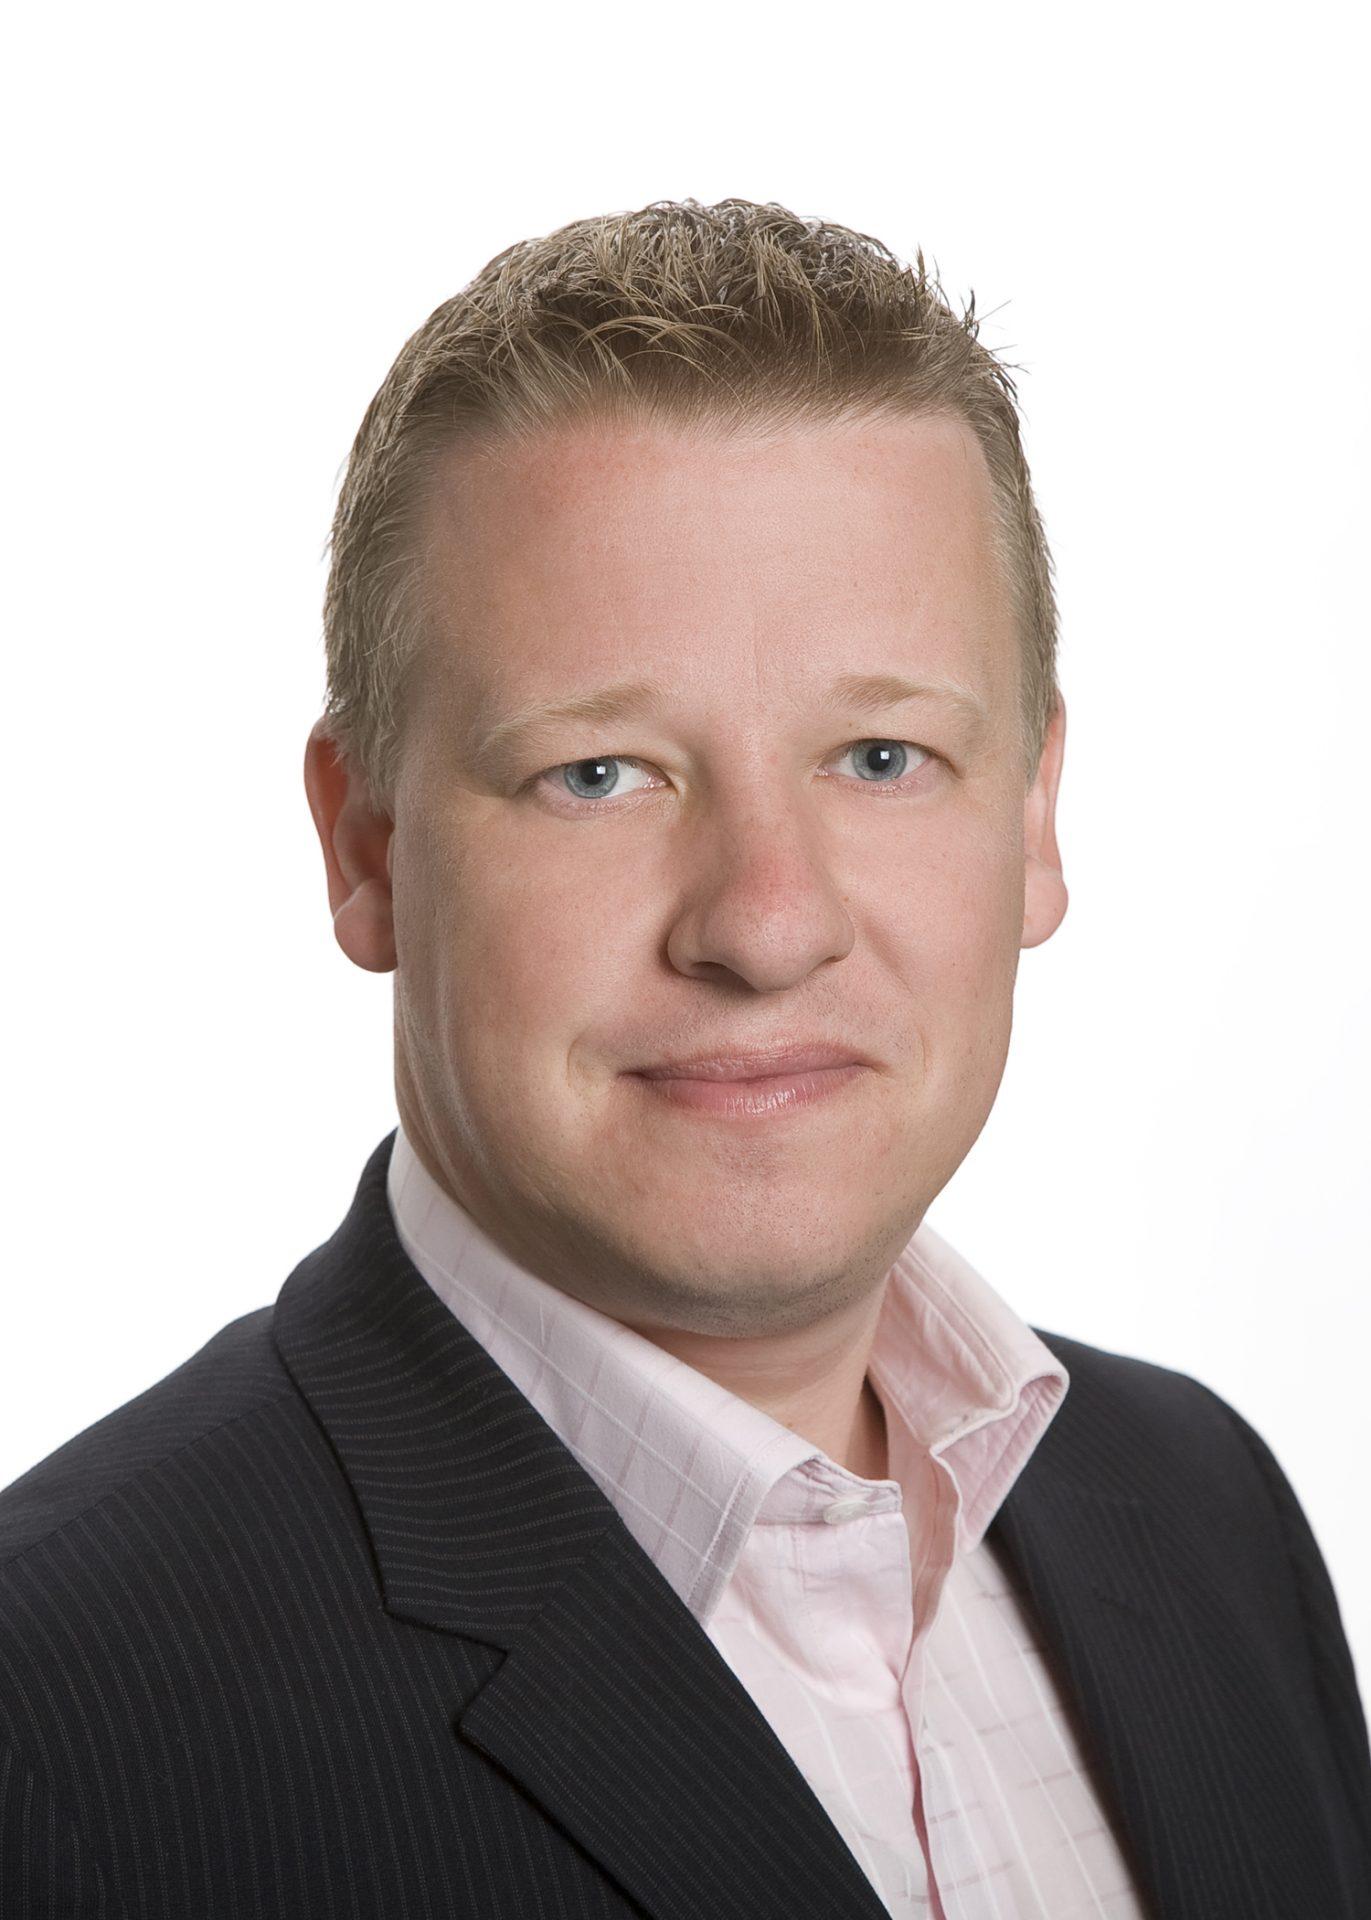 Darren Thomson